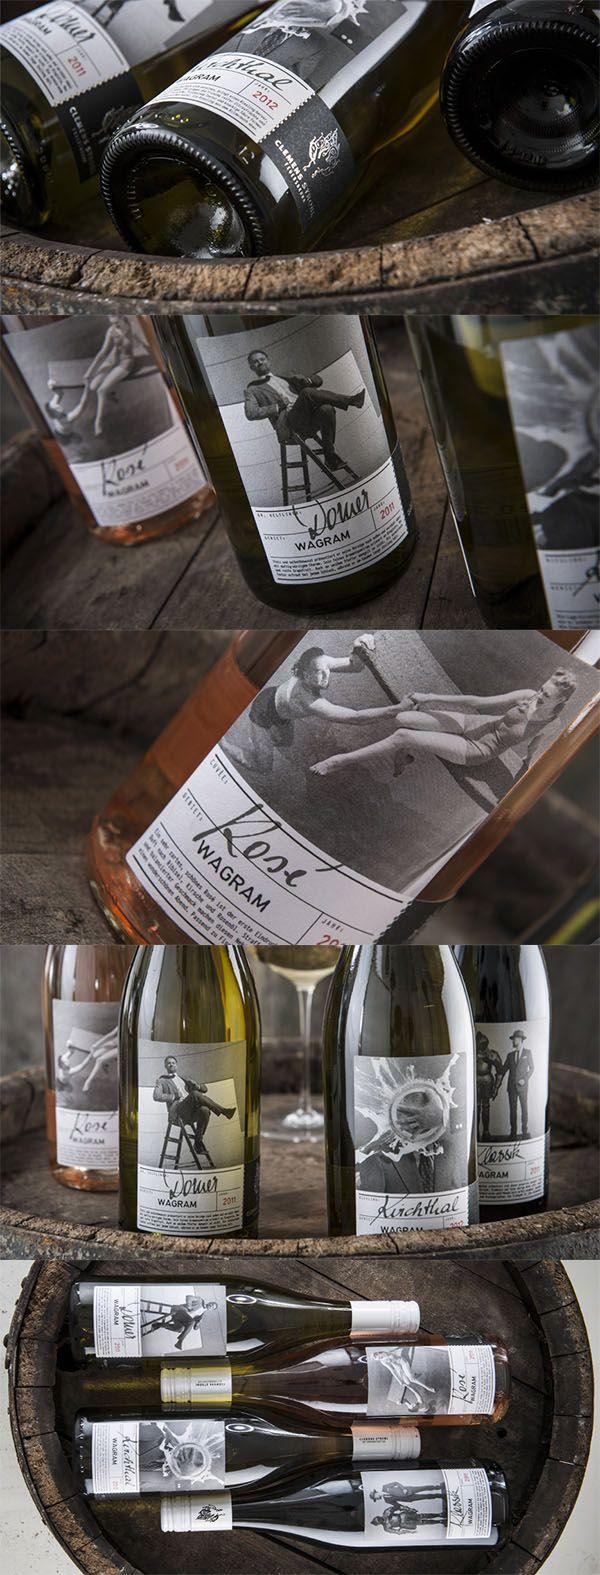 WEINMANUFAKTUR CLEMENS STROBL // Packaging Design Klassiklinie:  By www.strobl-kriegner.com #packaging #design #bottle